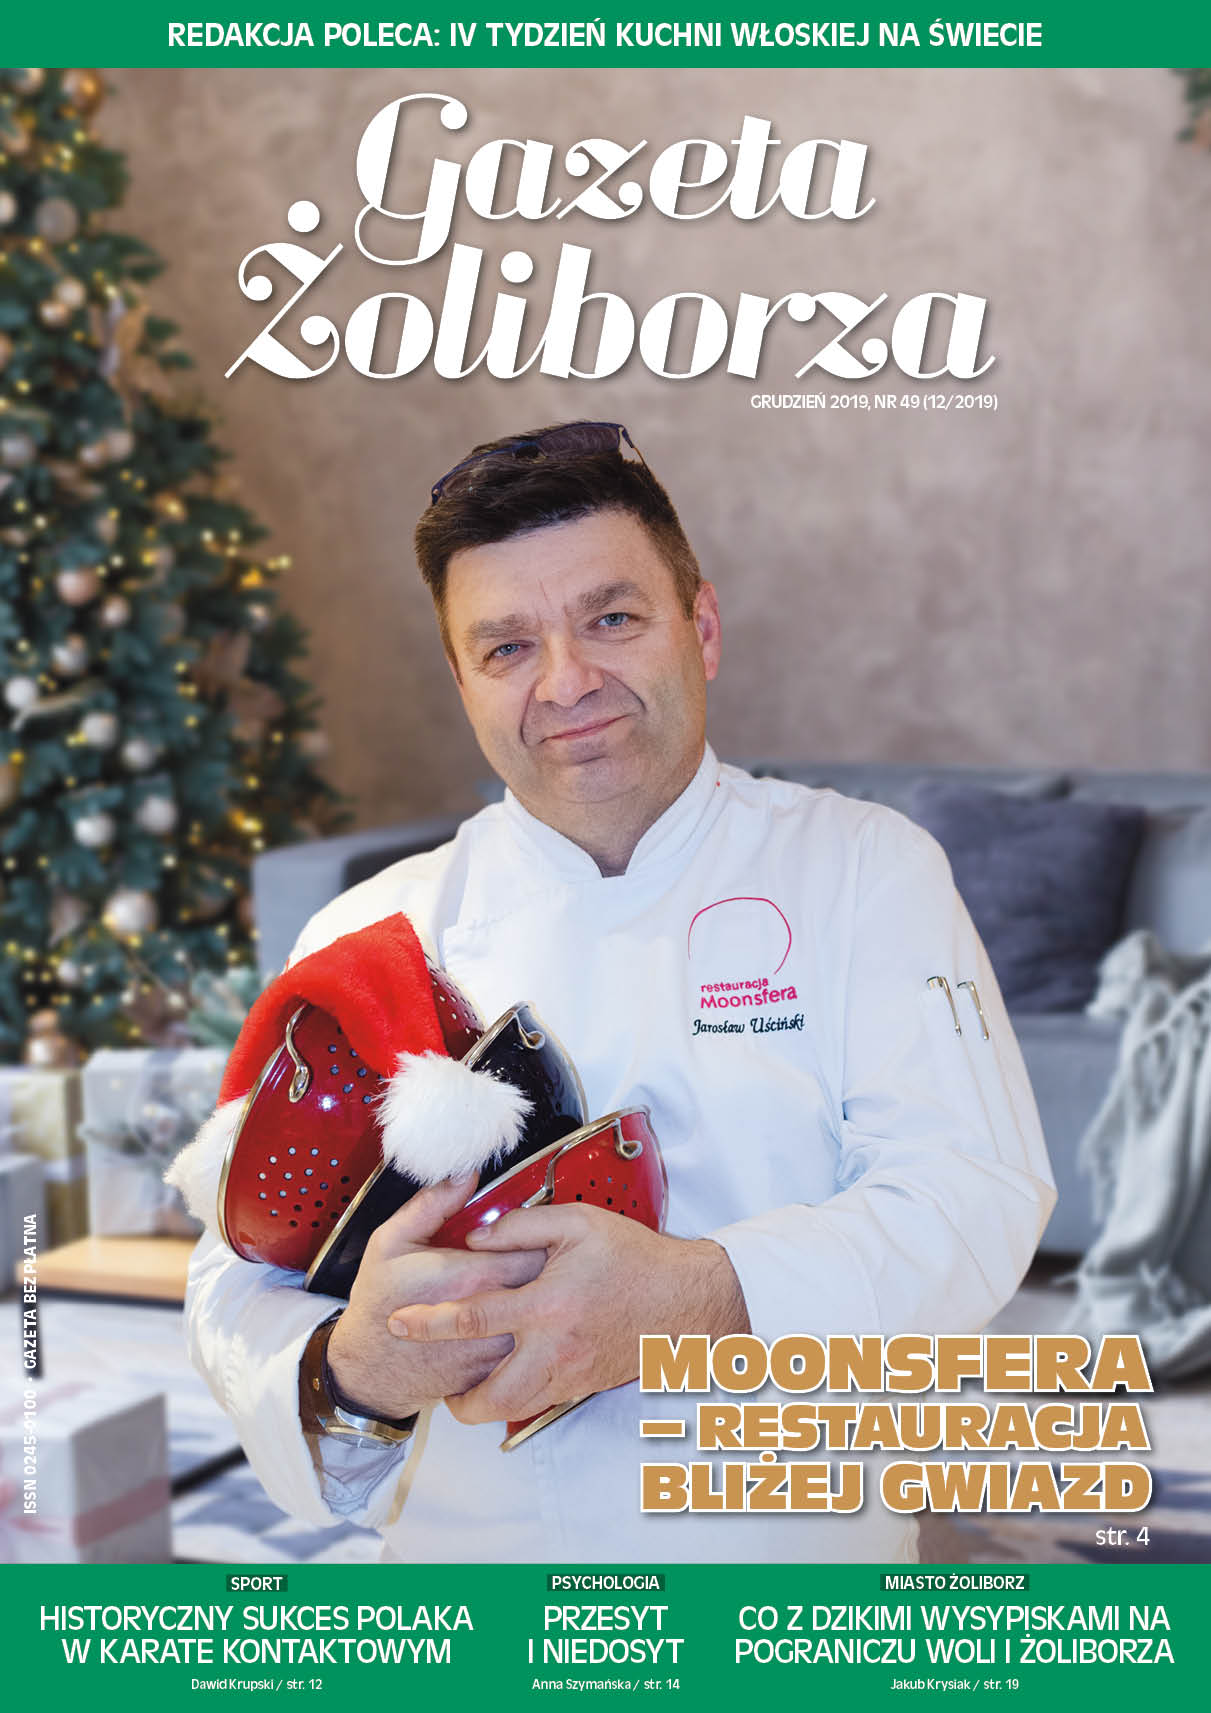 Gazeta Żoliborza - 12/2019 (49)